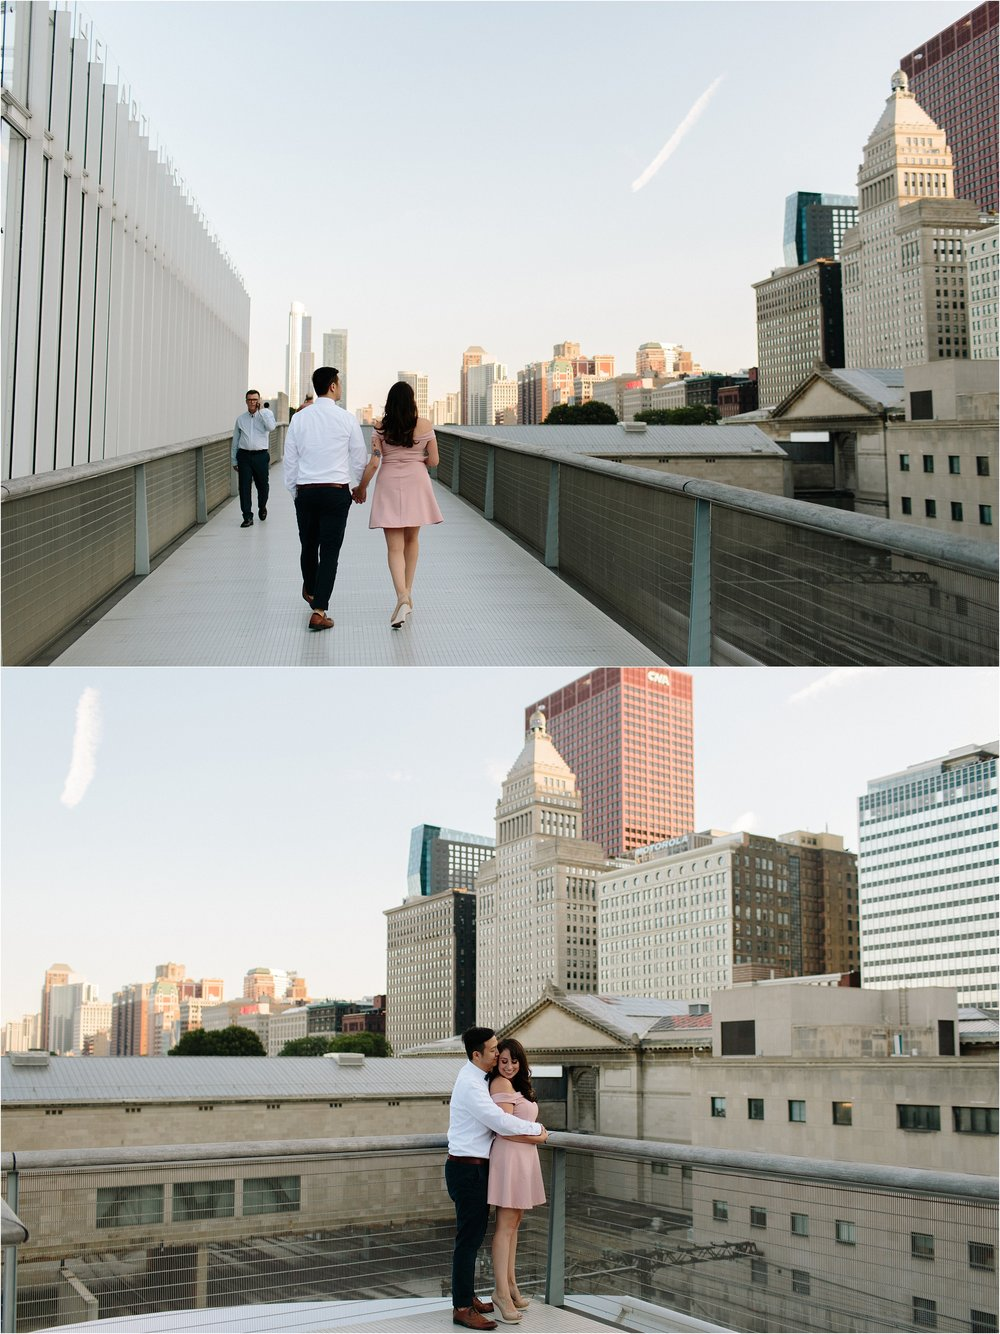 chicago-engagement-session-7.jpg